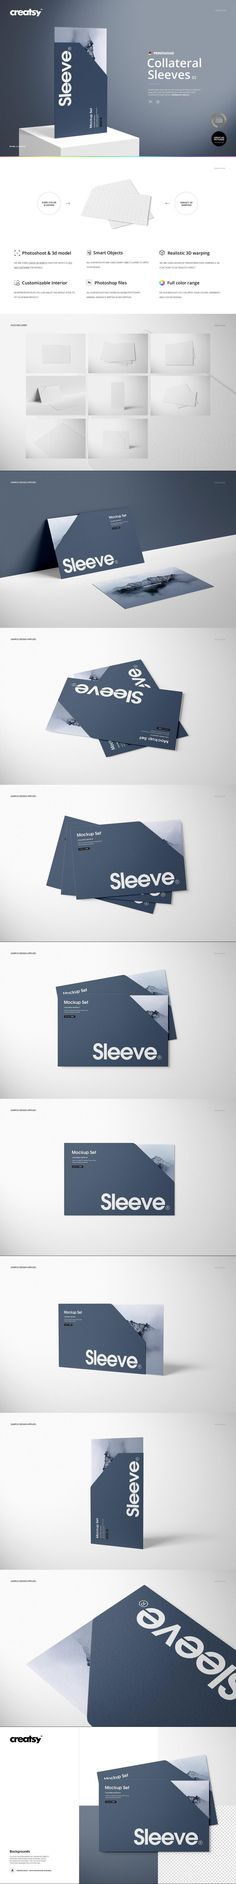 Collateral Sleeves Mockup Set (2) #shop #template #smart #psd #dinnerplatemockup #a4 #clothes #folded #flyer #etsy #printable #brochure #paperboard #mockup #heartmockup #mockup #MockupTemplate #minimal #pat Mockup Templates, Gown, Pocket, Patterns, Sleeves, Design, Dress Prom, Frock Dress, Robe